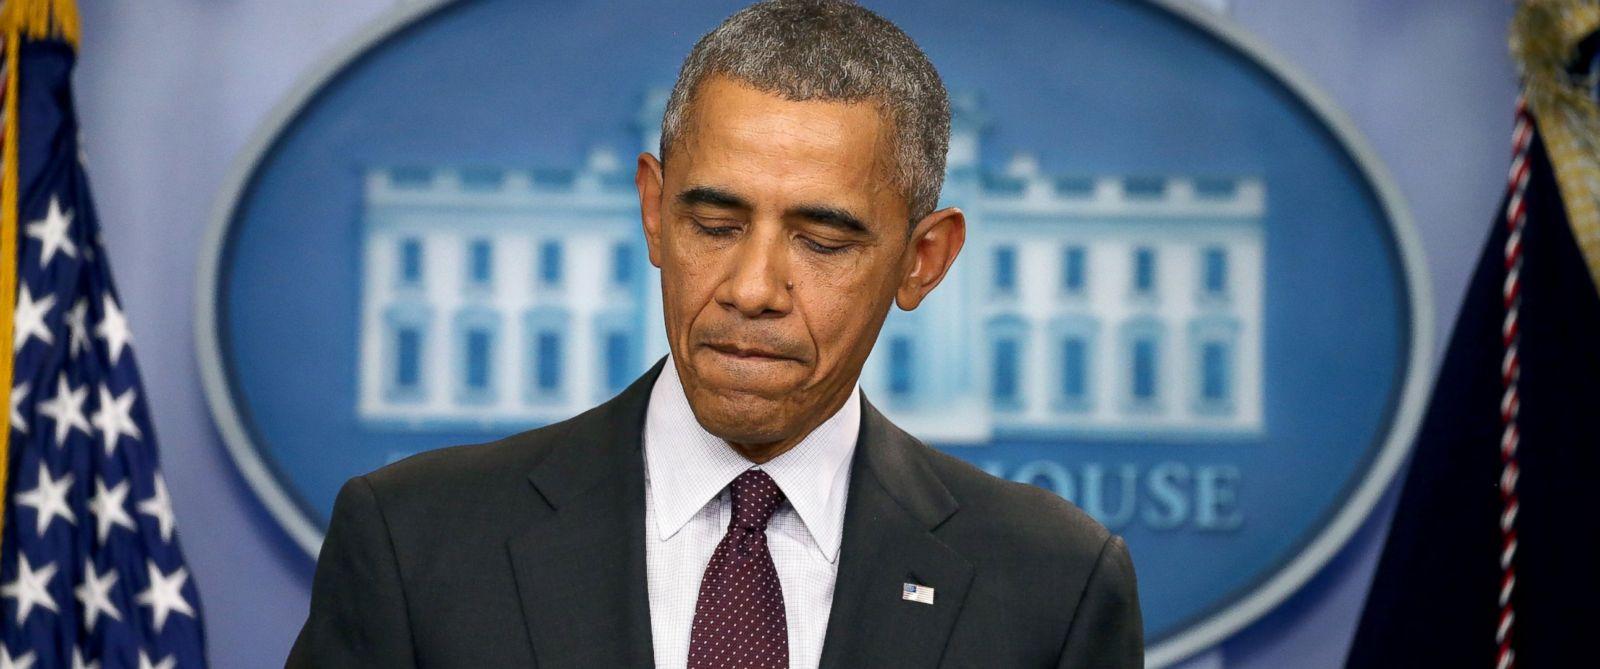 PHOTO: President Barack Obama speaks at a press conference, Oct. 1, 2015, in Washington.